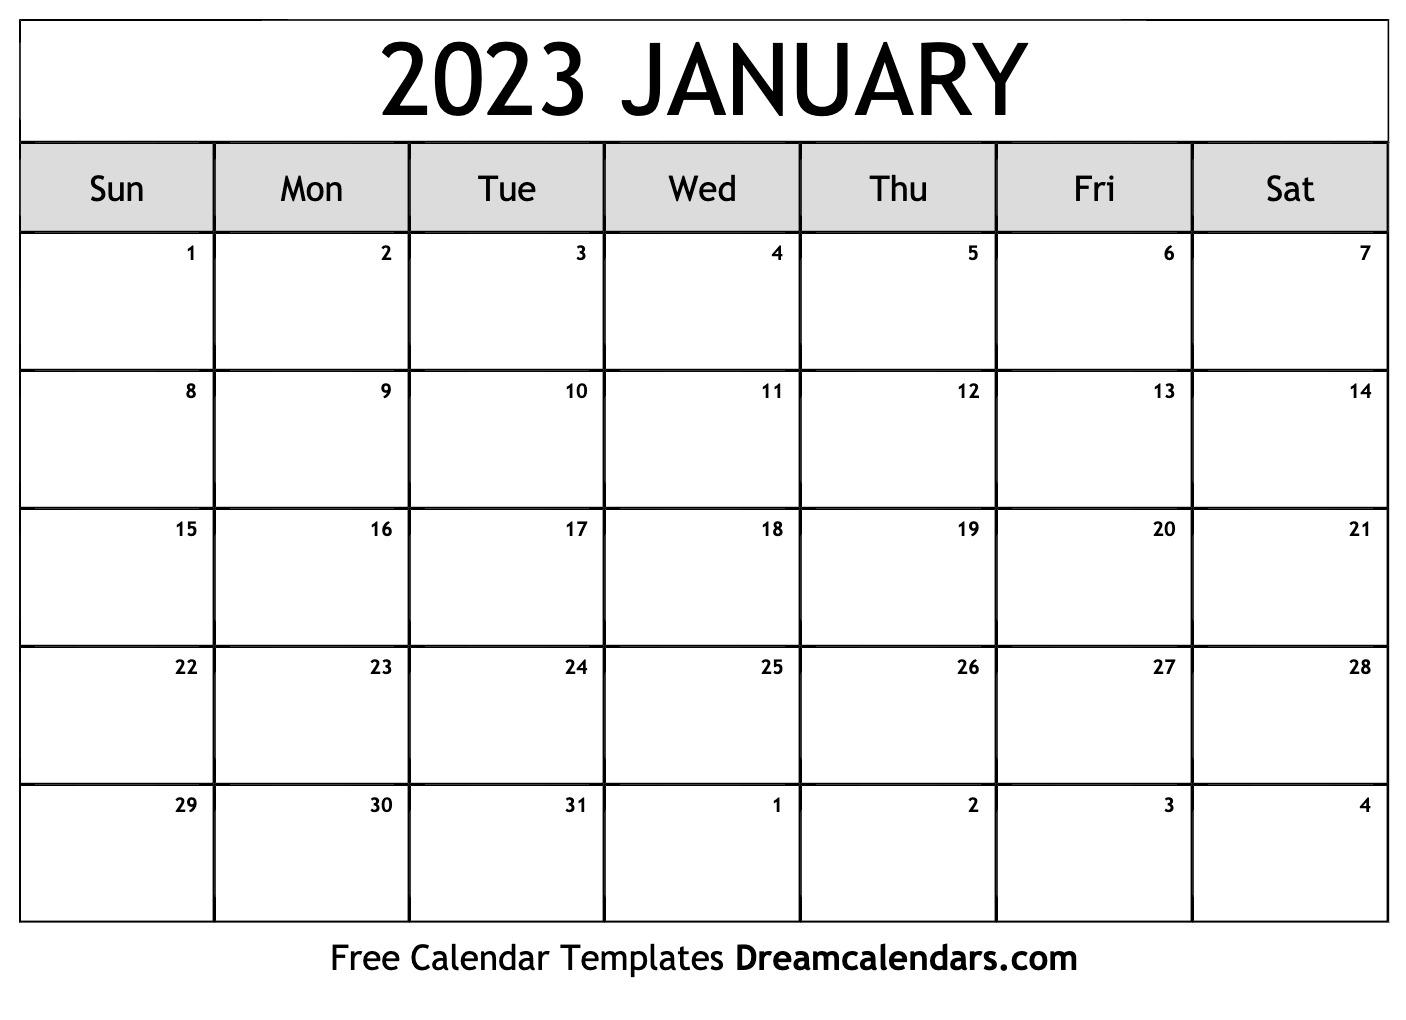 December 2022 And January 2023 Calendar.January 2023 Calendar Free Blank Printable Templates